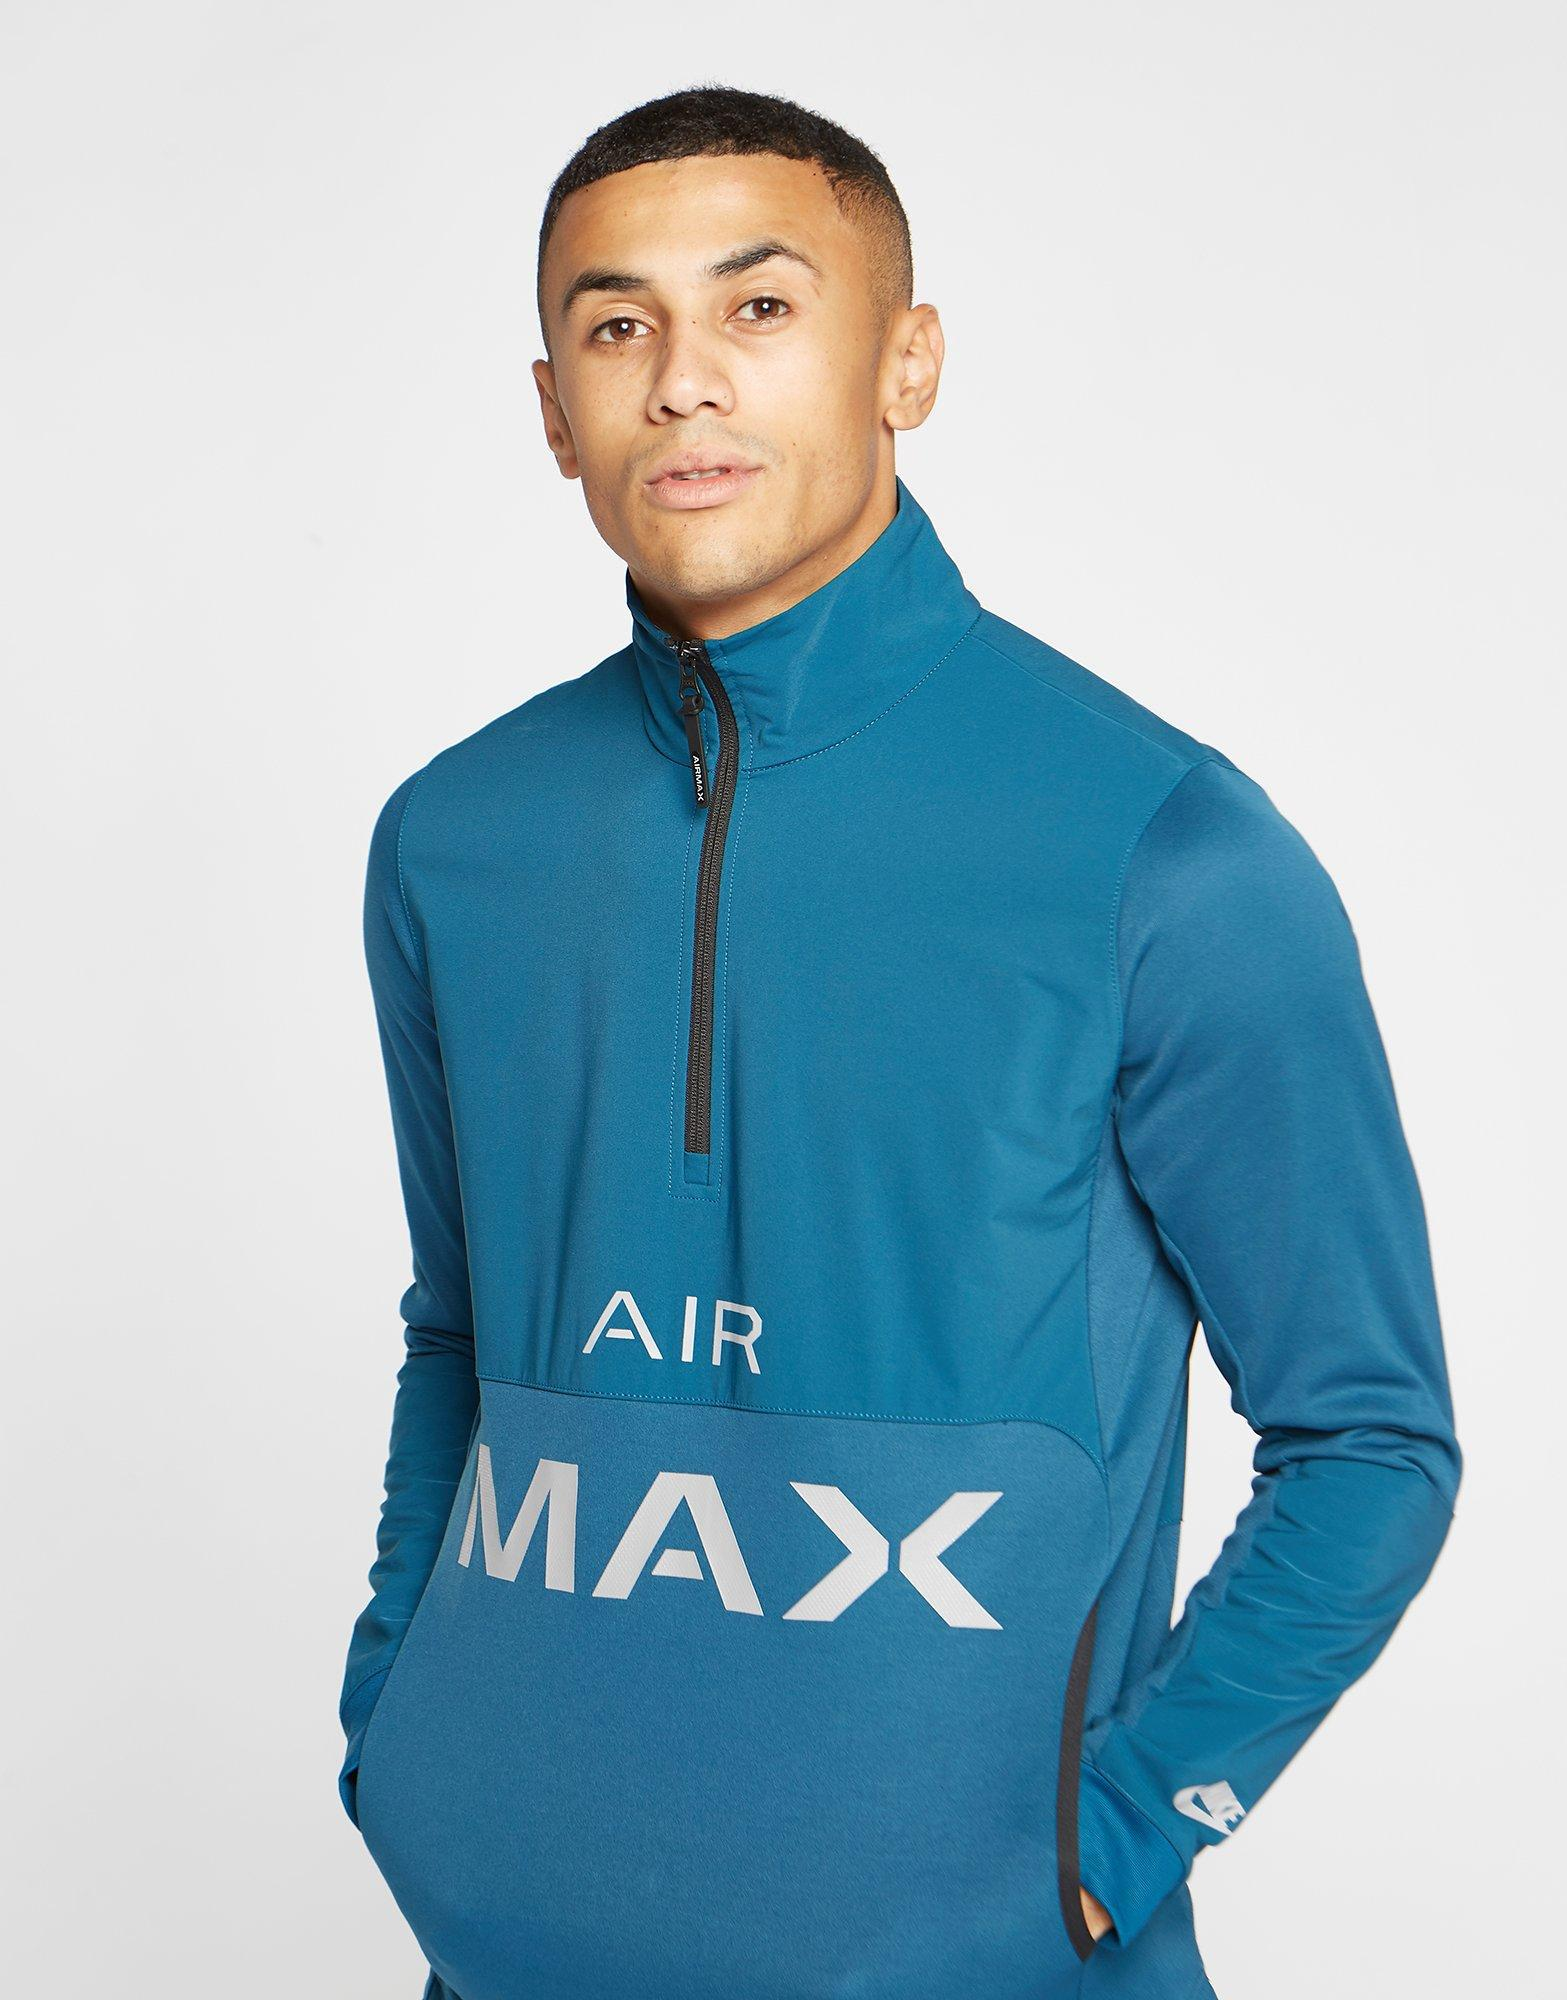 34c215abd1 Lyst - Nike Air Max Poly 1 2 Zip Sweatshirt in Blue for Men